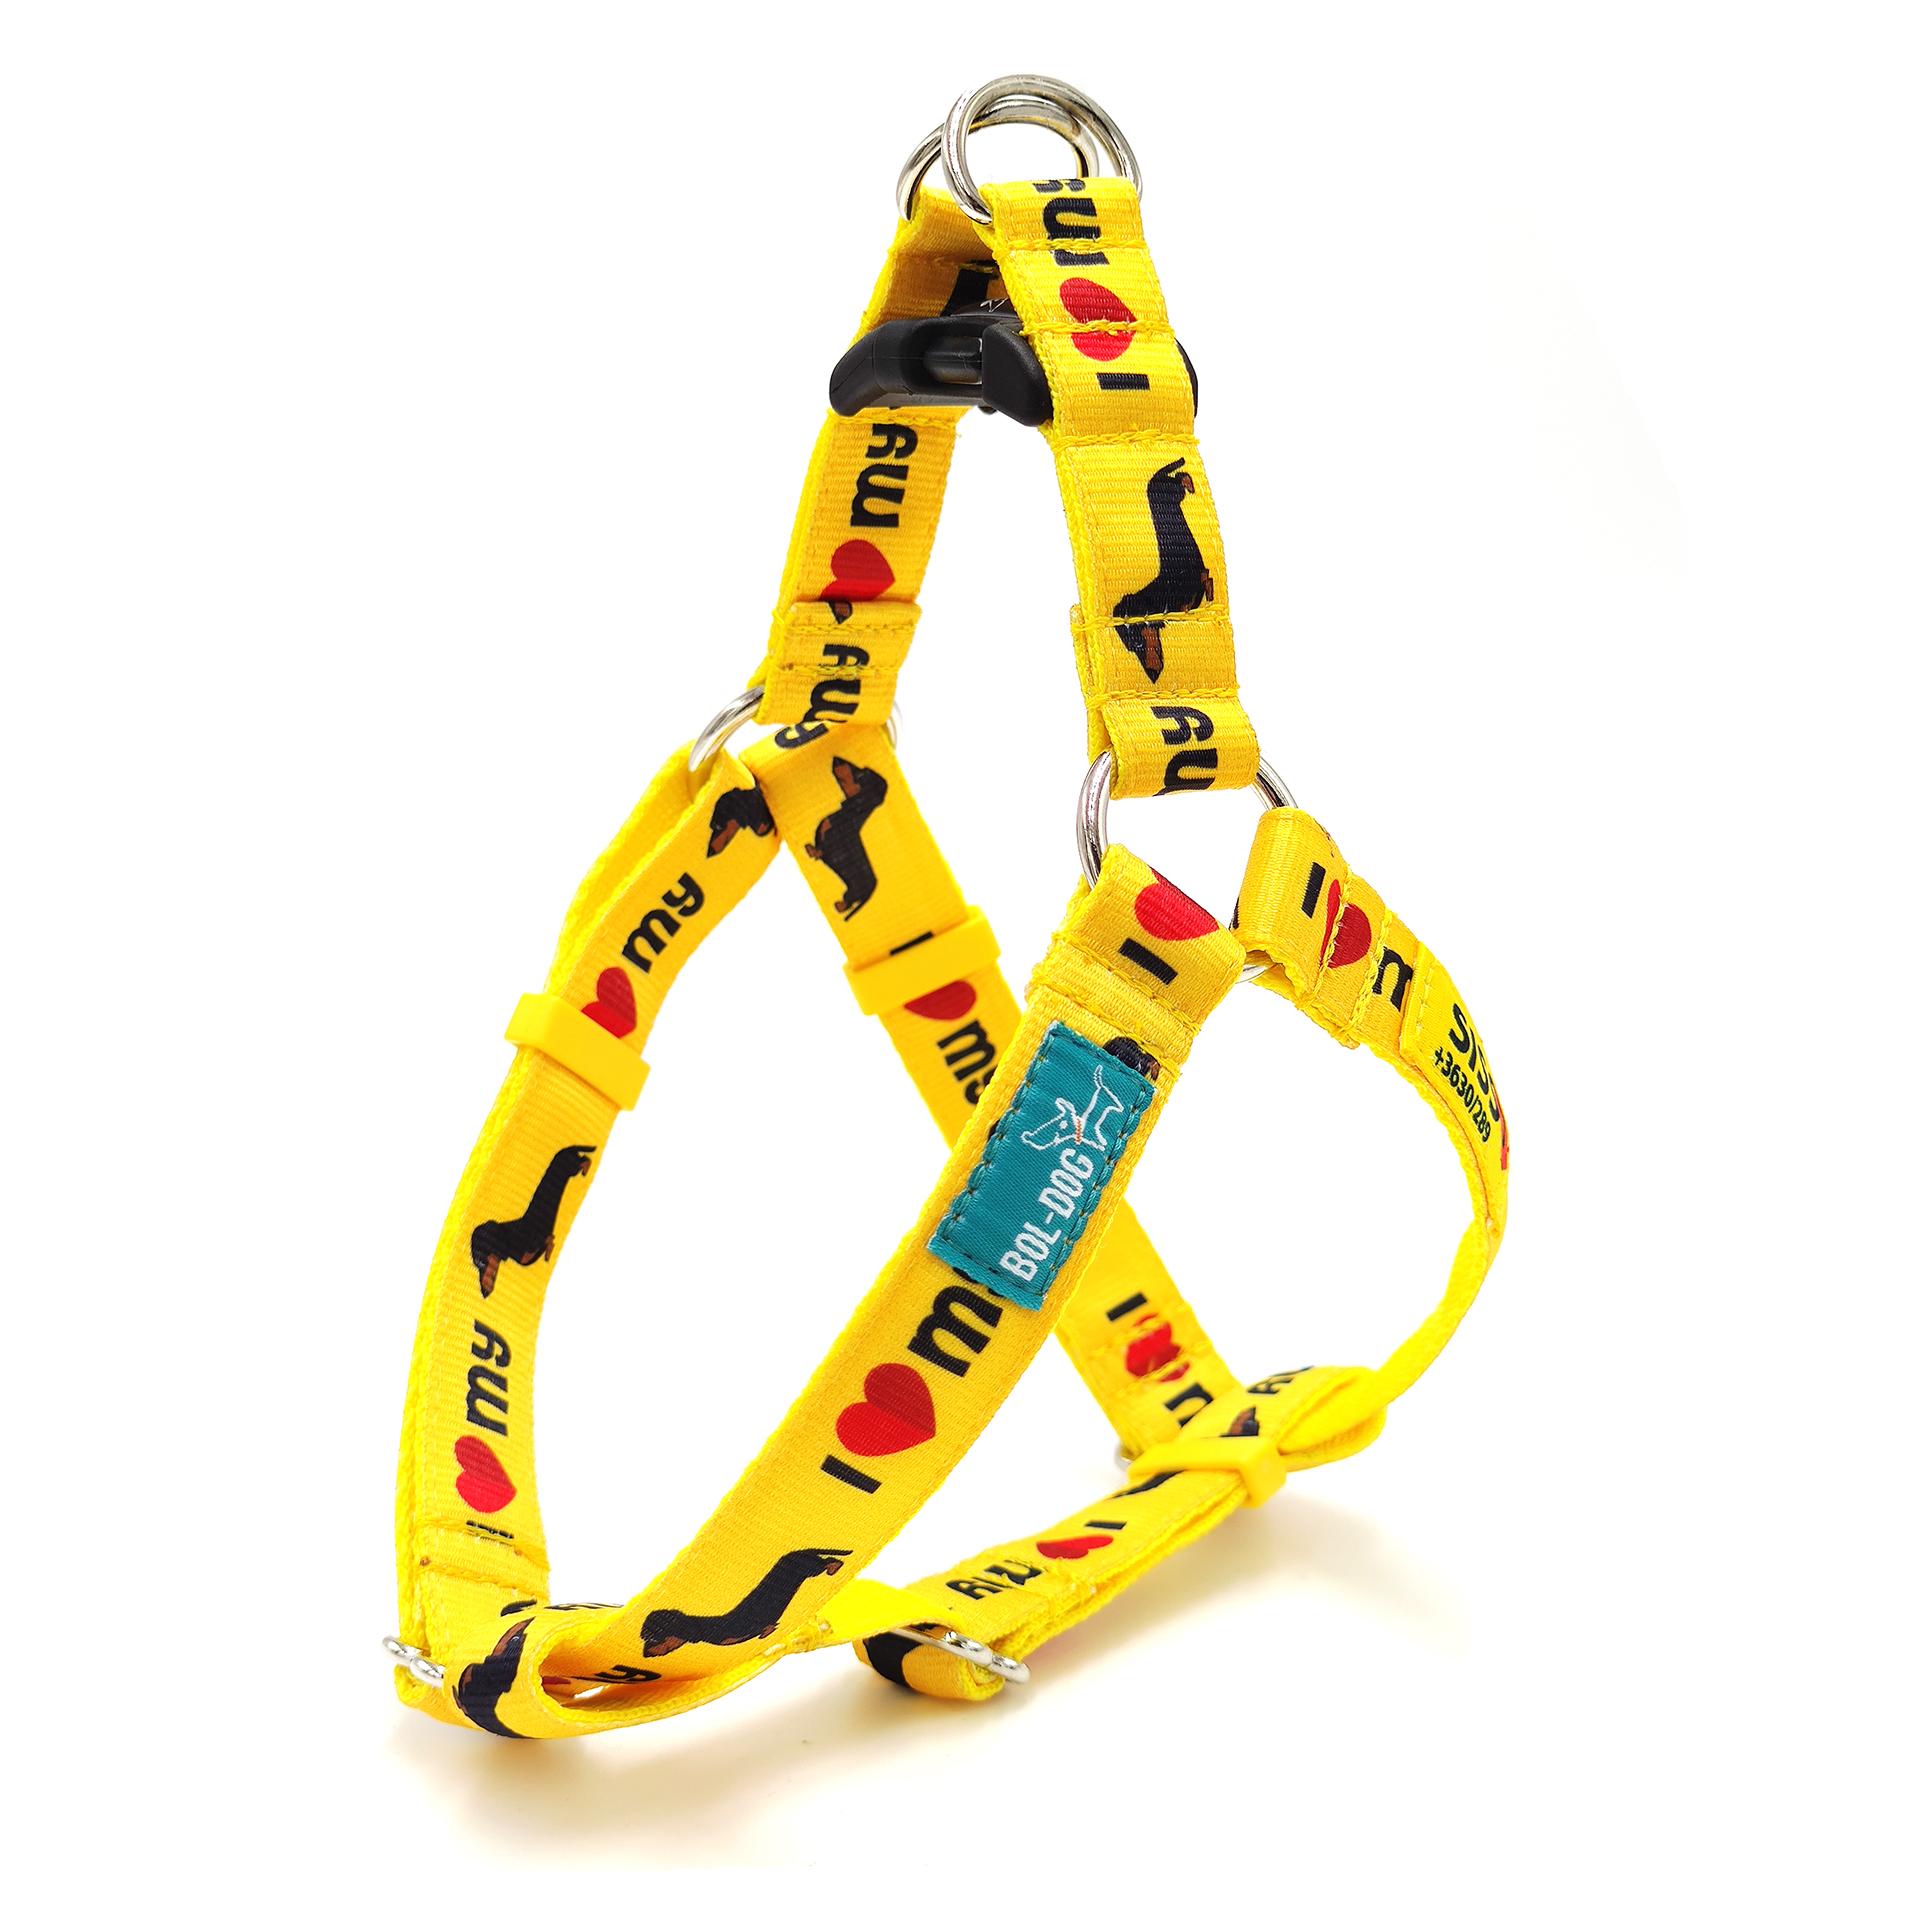 Dachshund yellow dog harness